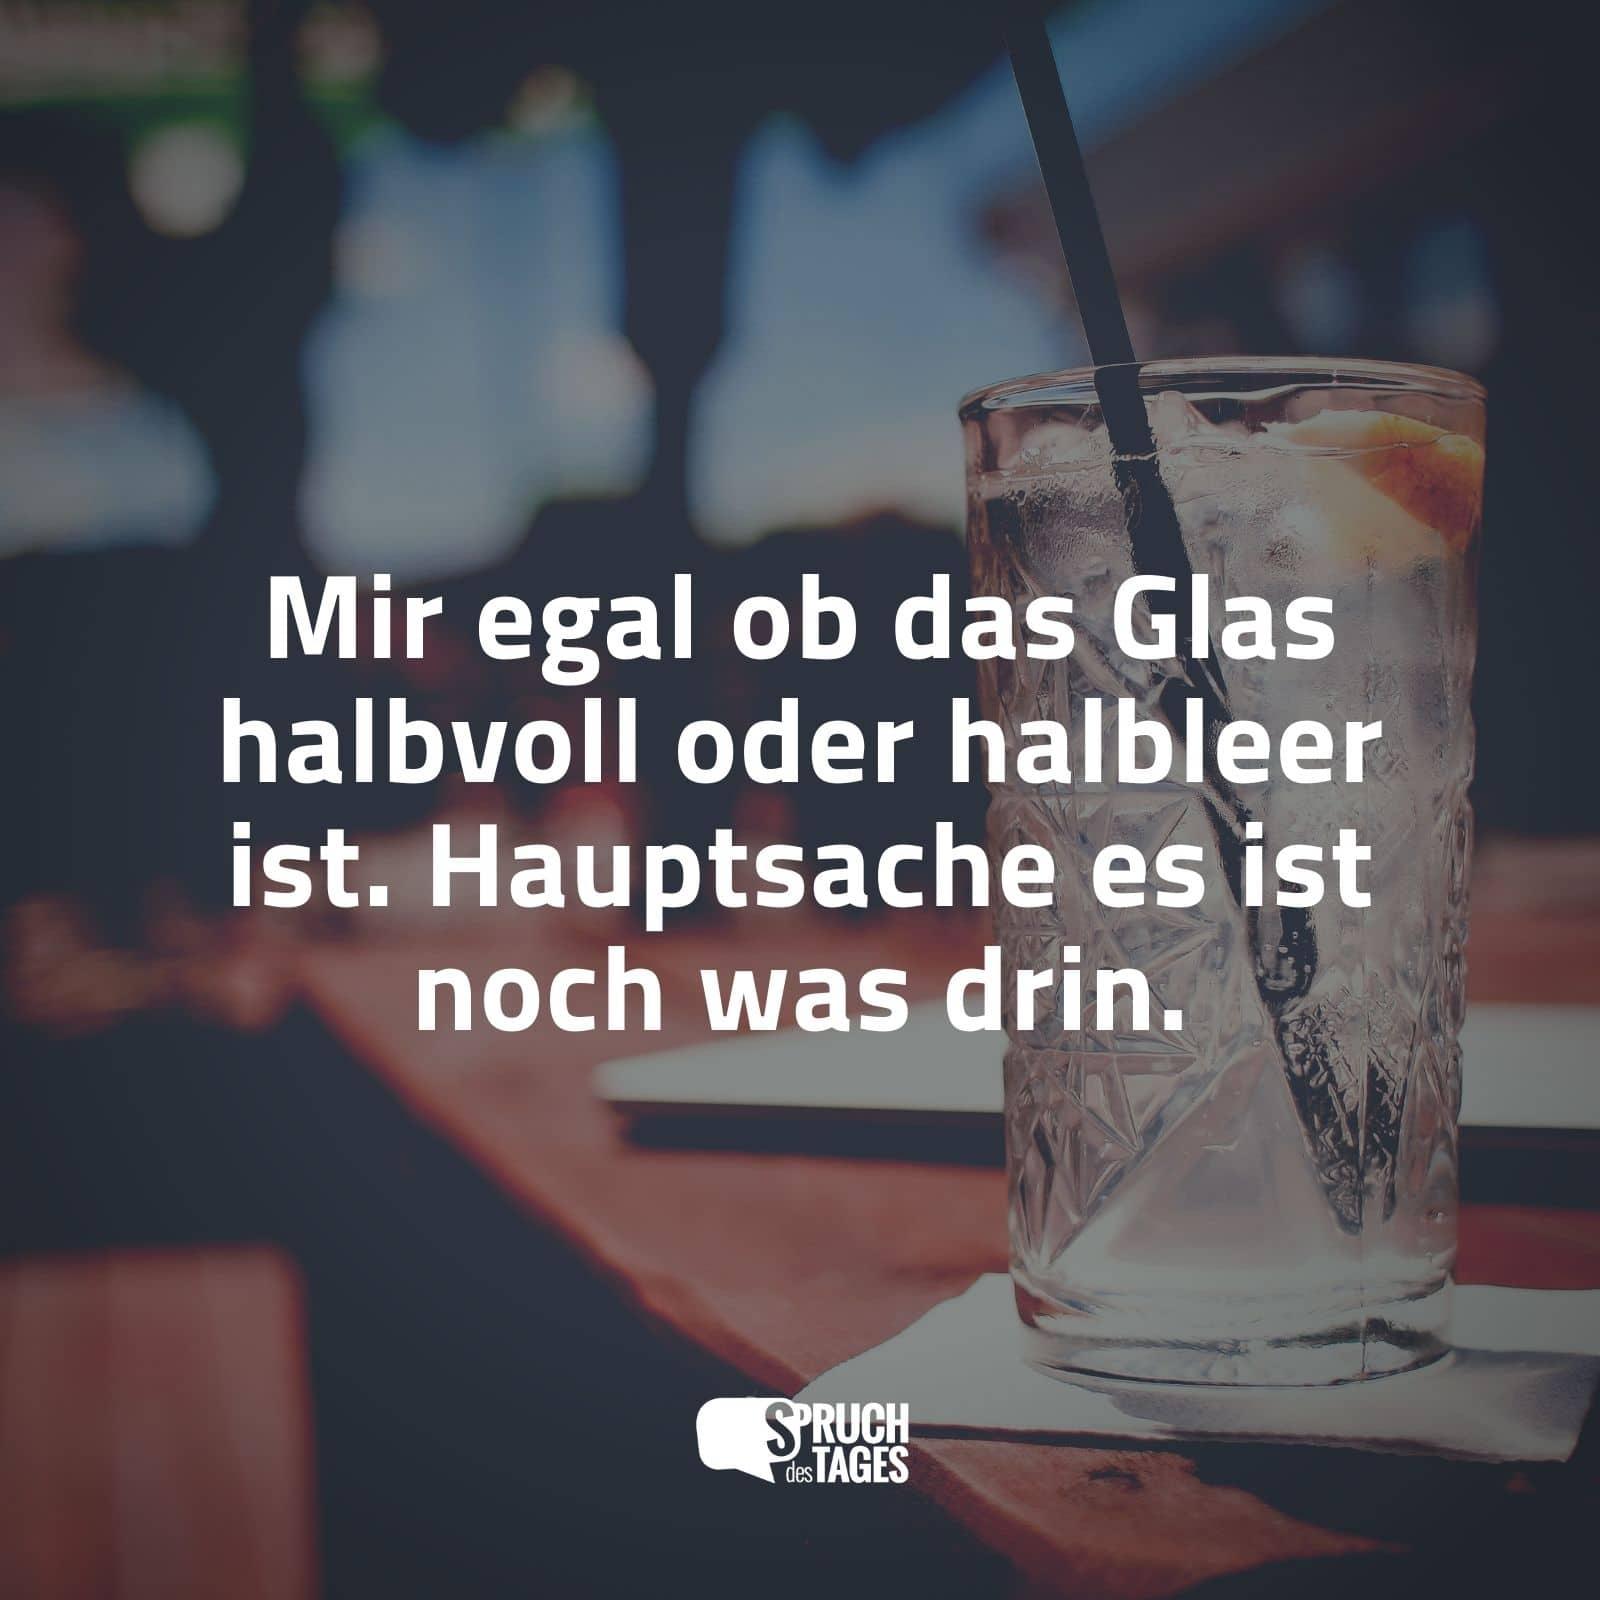 Mir Egal Ob Das Glas Halbvoll Oder Halbleer Ist. Hauptsache Es Ist Noch Was  Drin